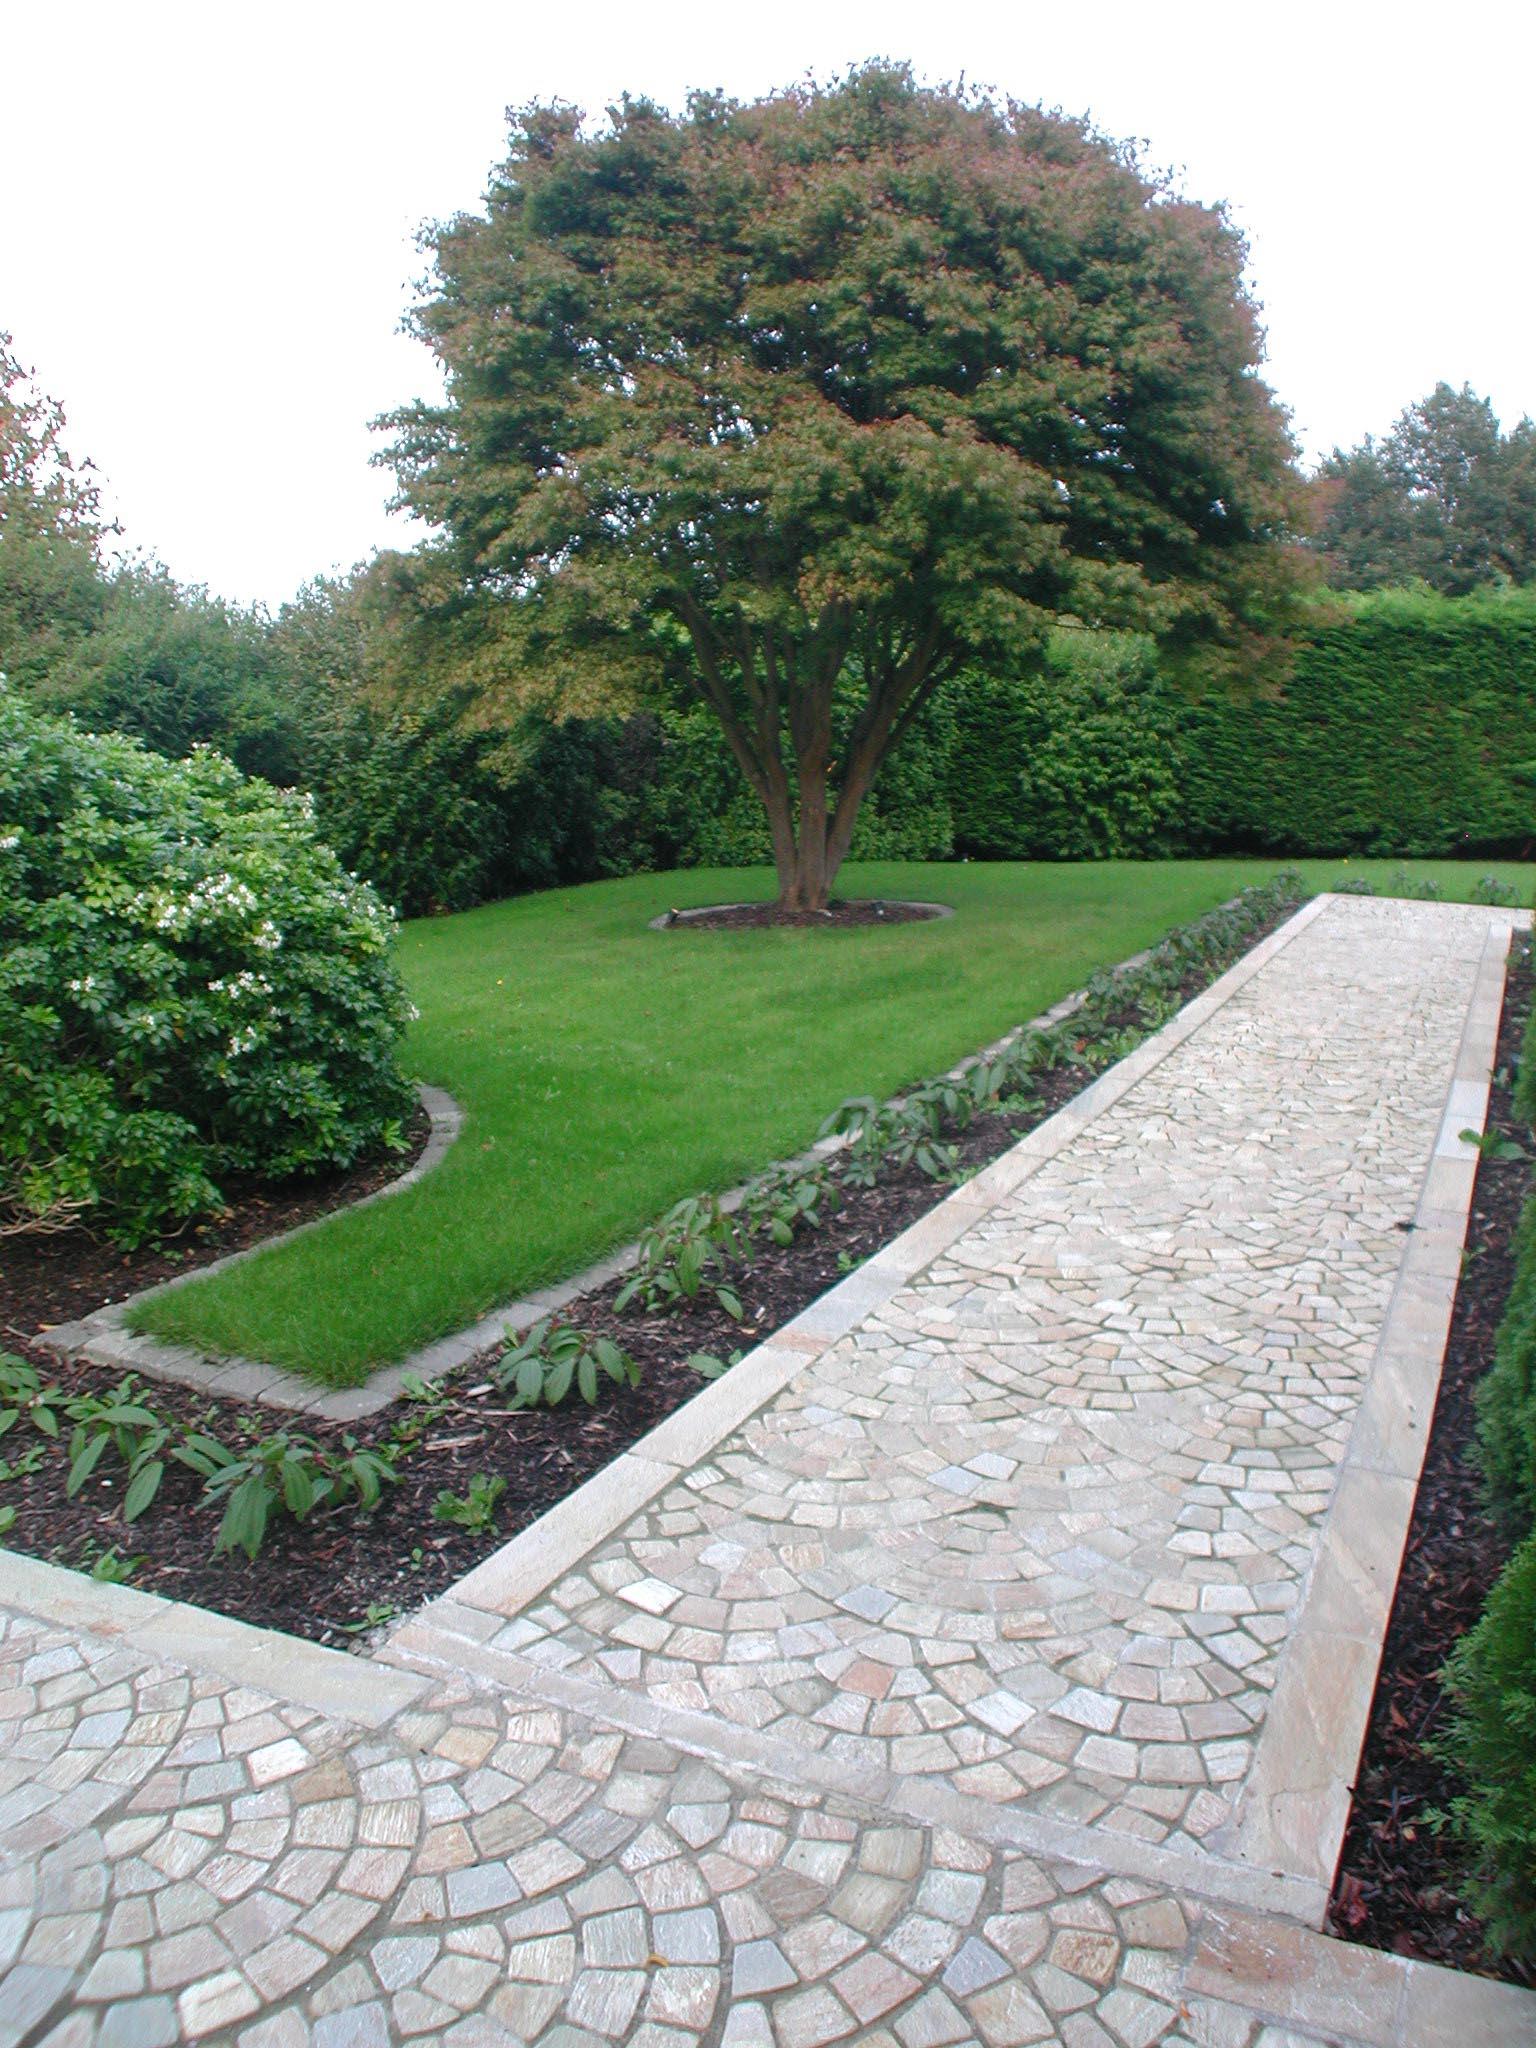 Dalkey Dublin Landscaping Garden Design Driveways Outdoor Lighting Garden  Path And Landscaping Design In Dalkey Dublin Ireland Garden Pathway Designs